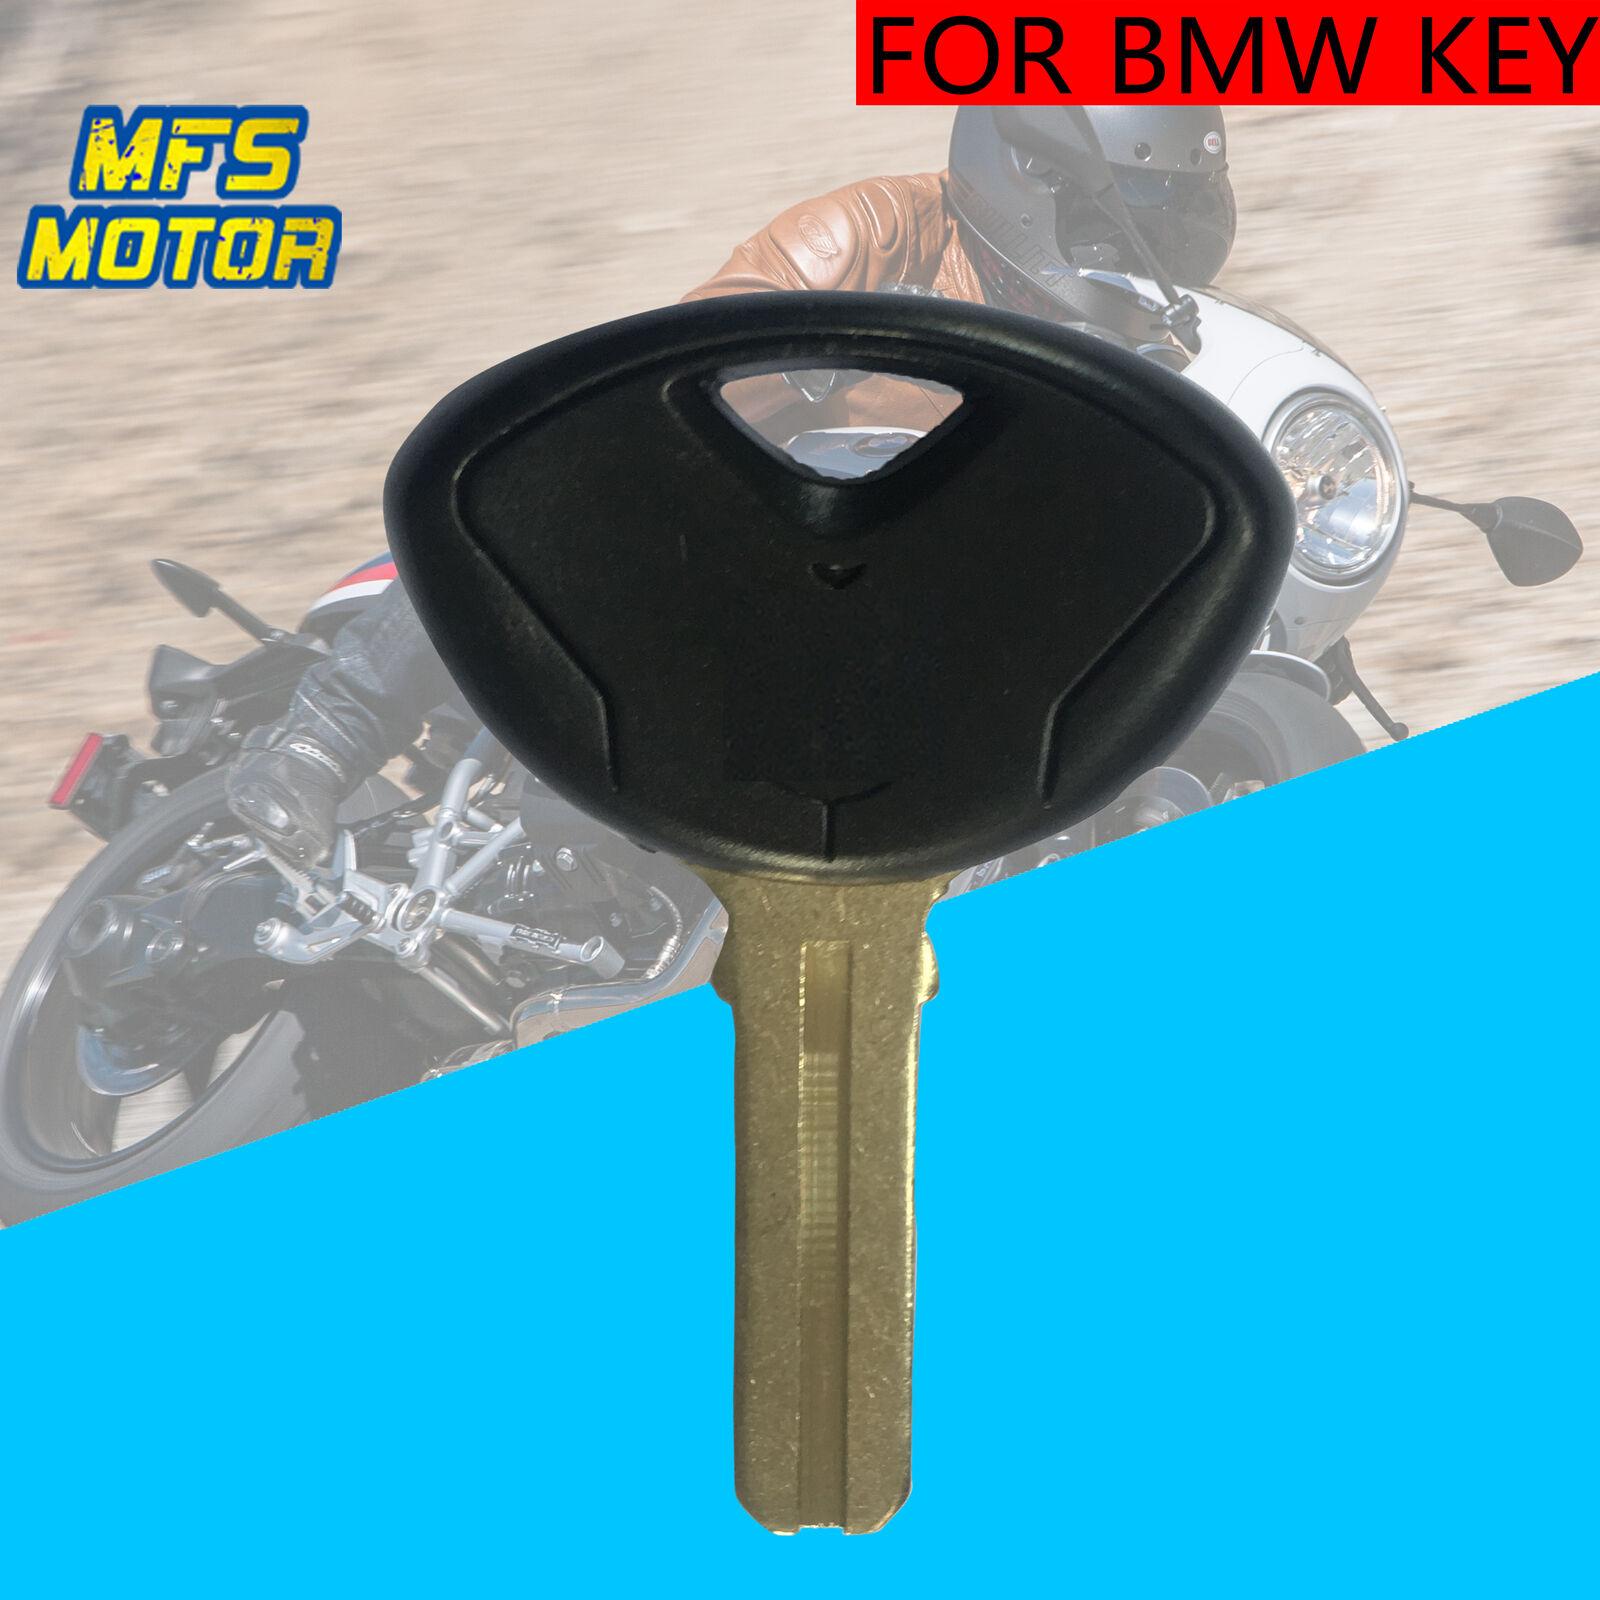 Großhandel Schlüssel F800 Rohlinge Für BMW R/S-R1200/R/GS S1000RR F800 Schlüssel K1300R/S/GT 4ca845